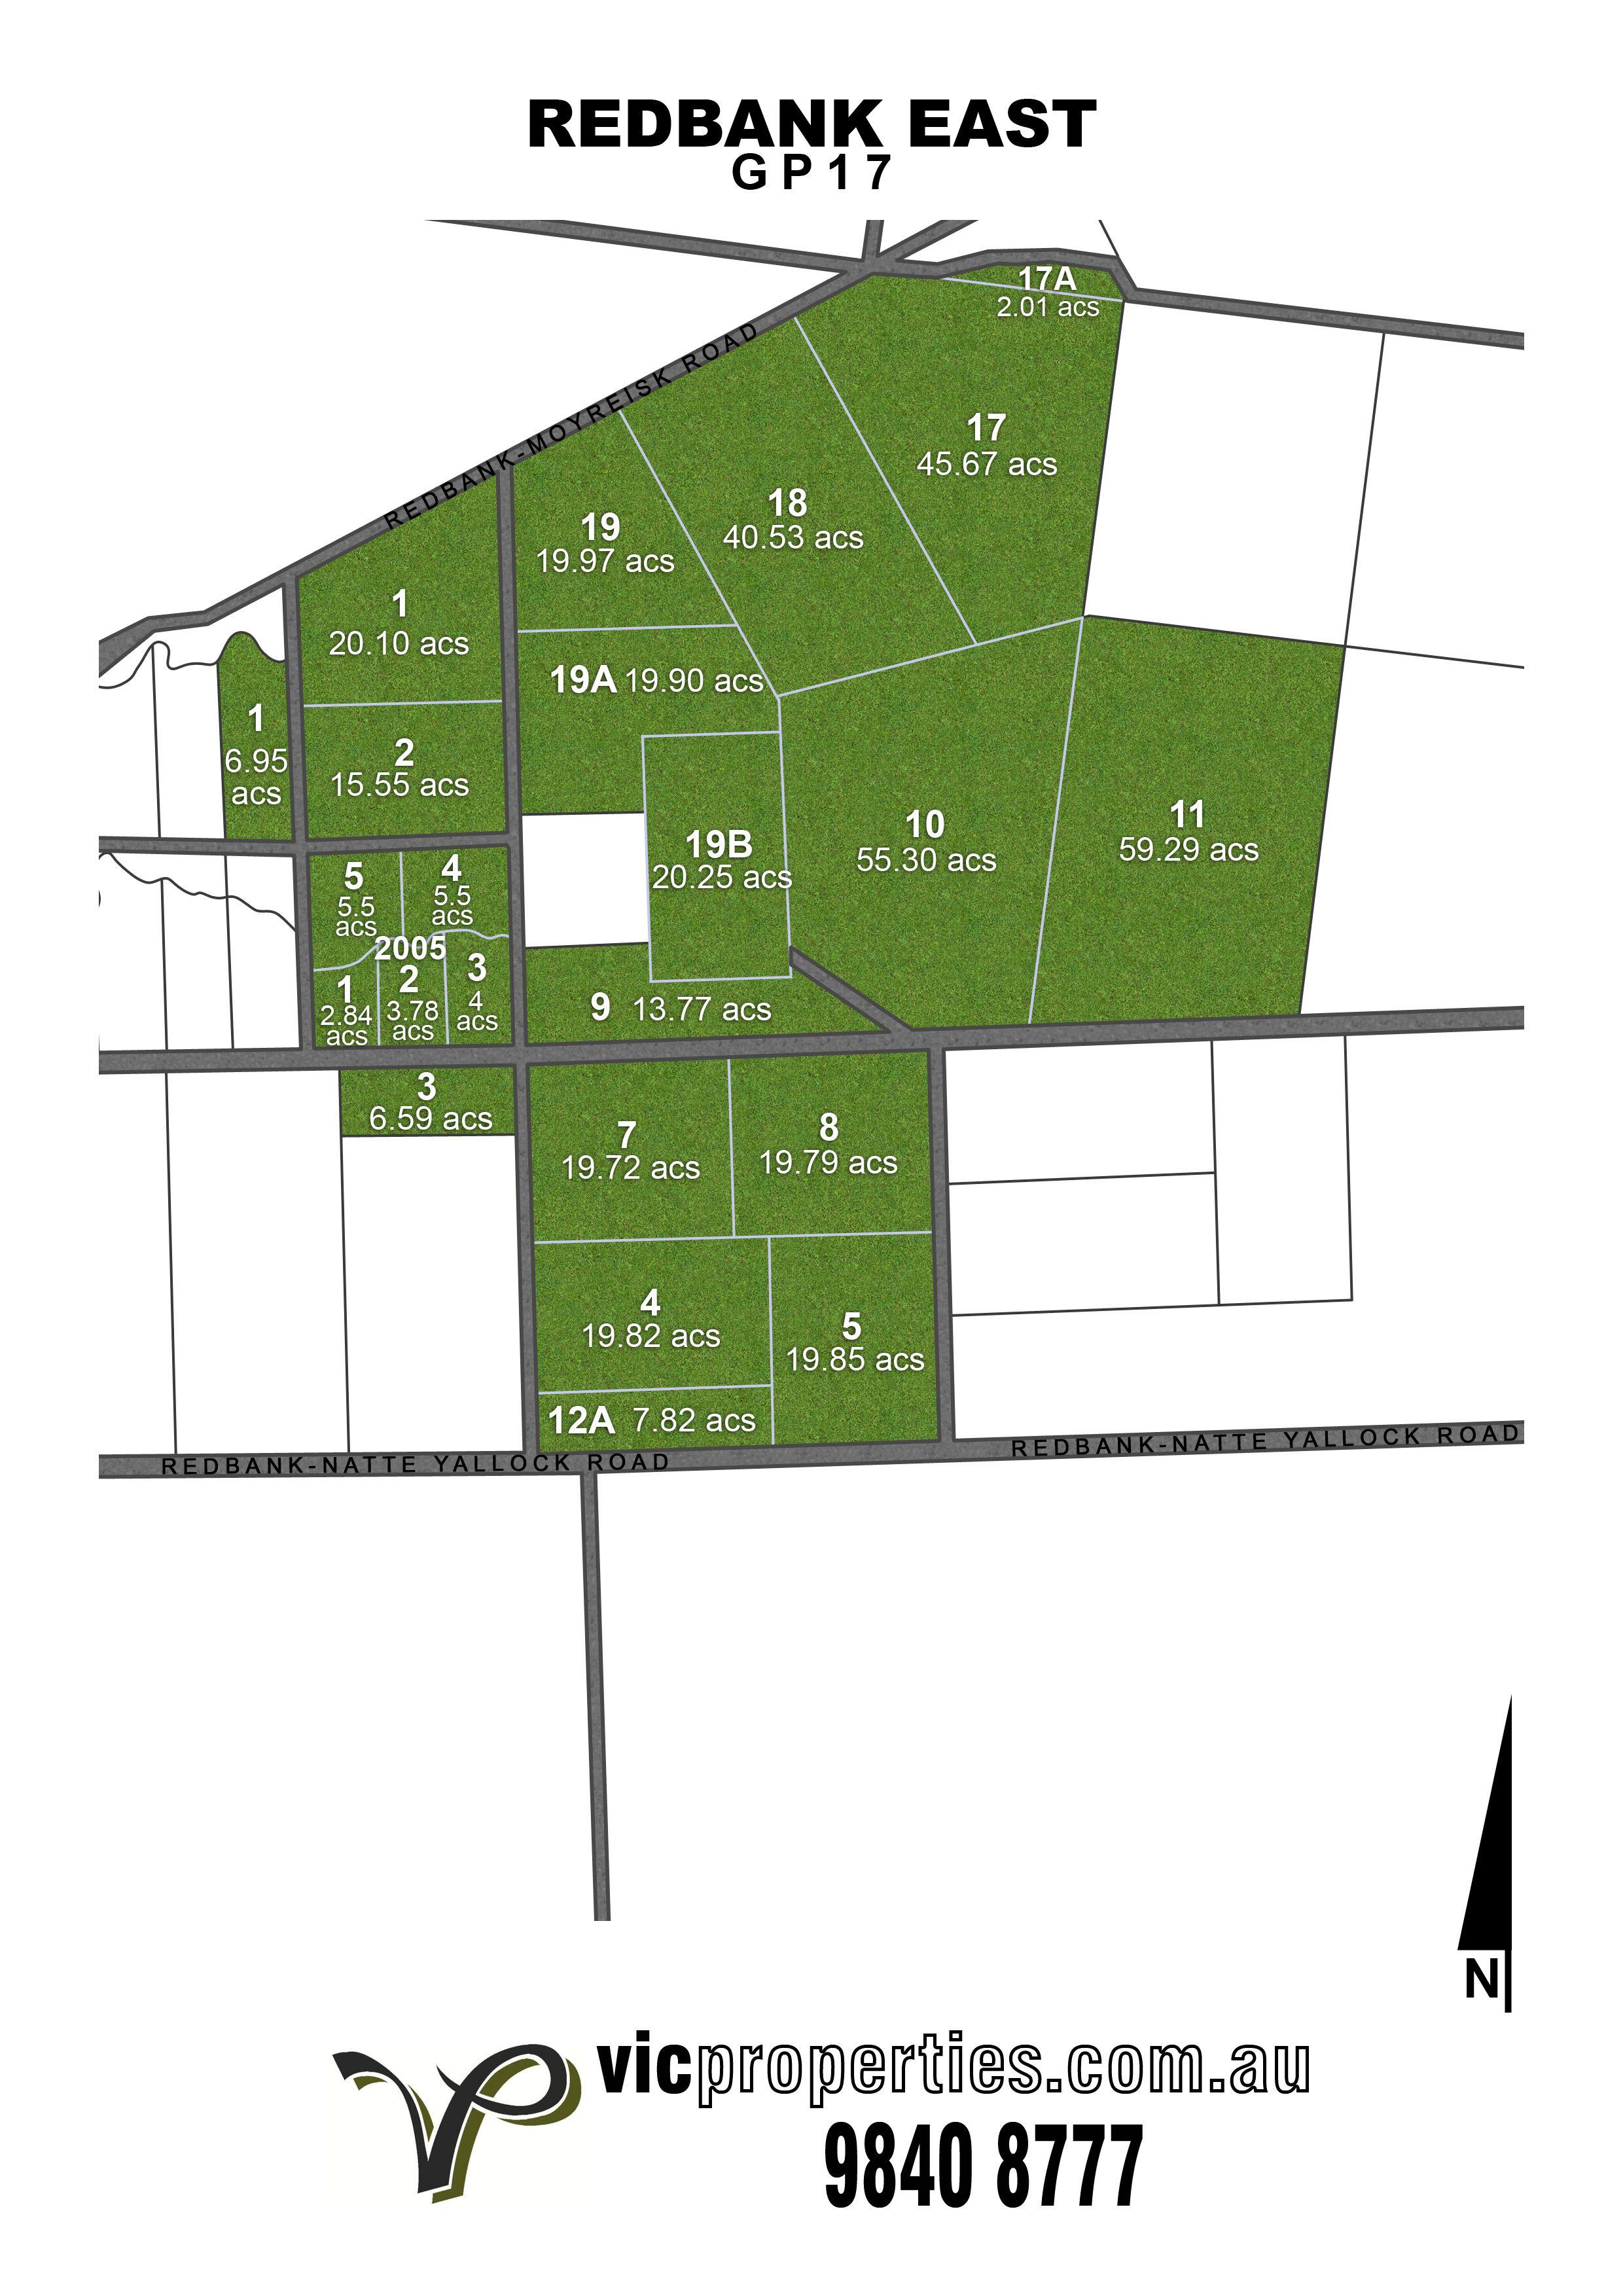 Lt 5 secJ/ Redbank-Natte Yallock Road, Redbank VIC 3477